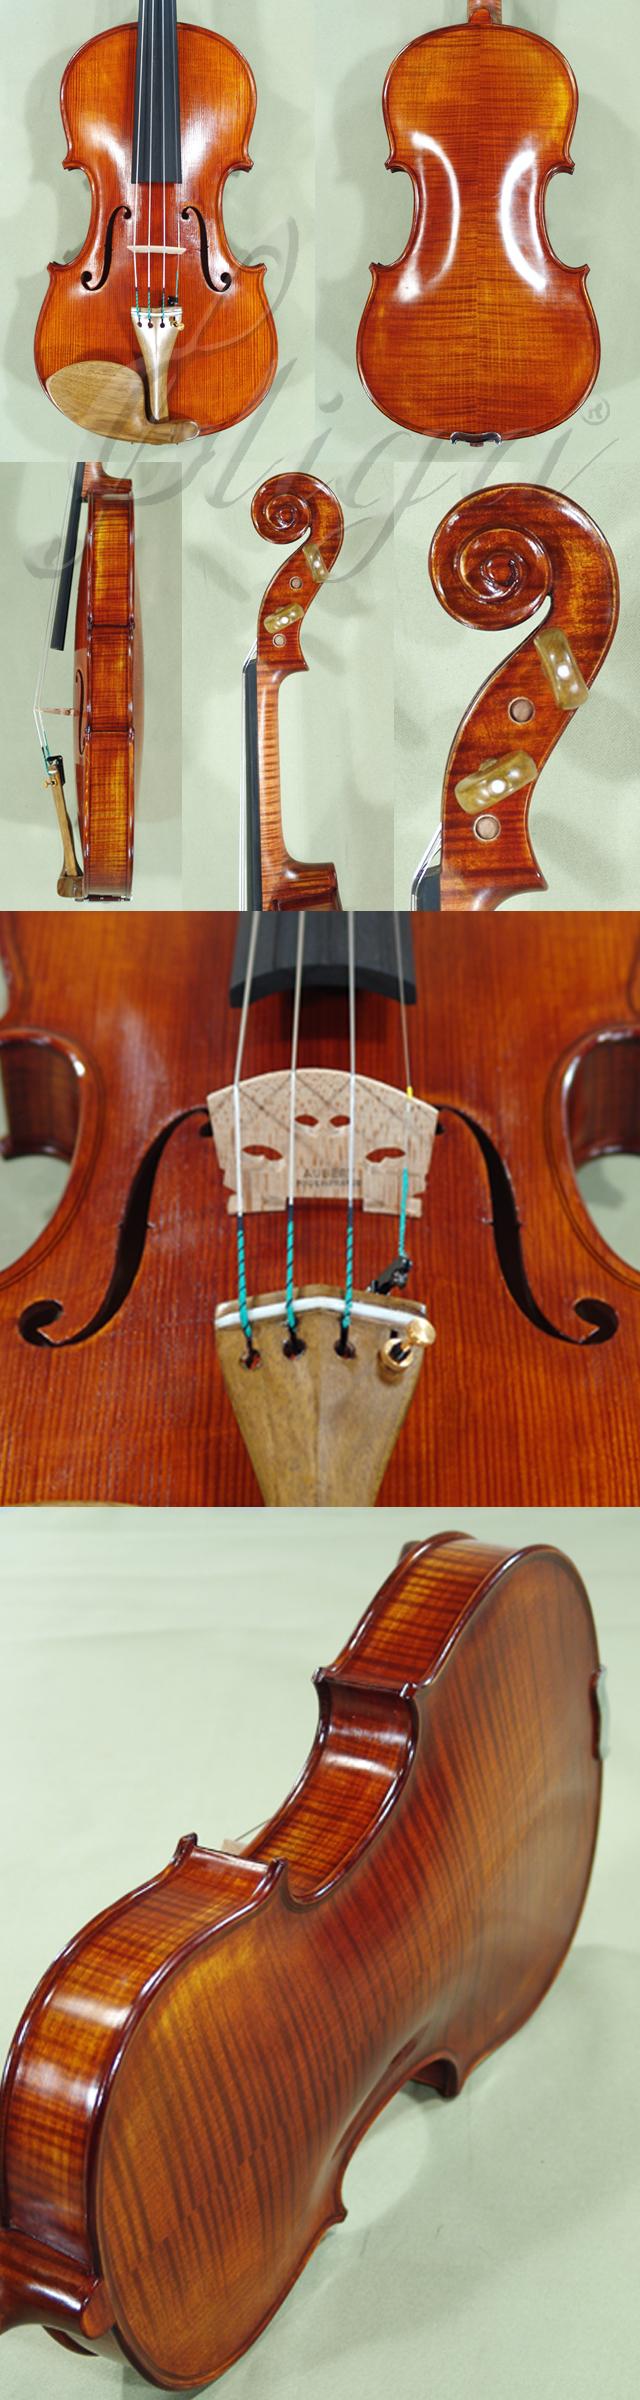 Regular Spirit Varnish 4/4 CERUTI CONCERT Violin - 'Feel the Grain!' Code B6712